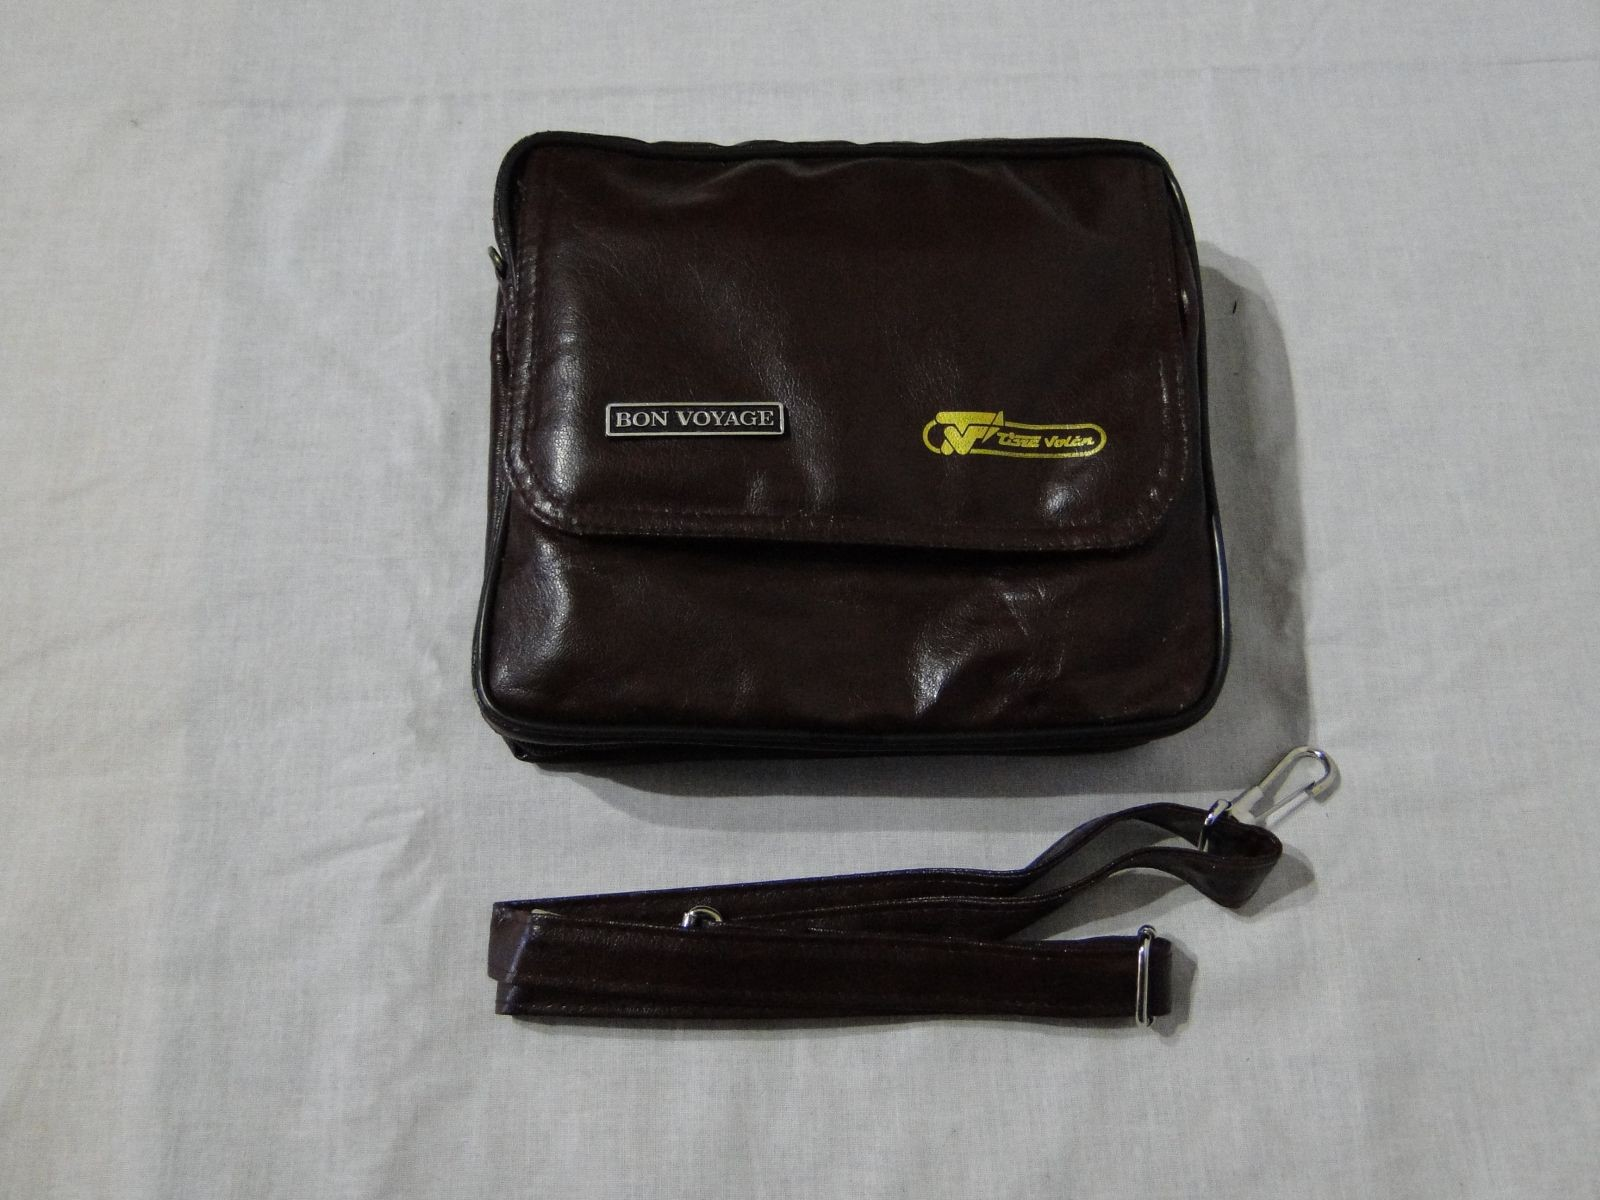 DSC00376.JPG (1600×1200)